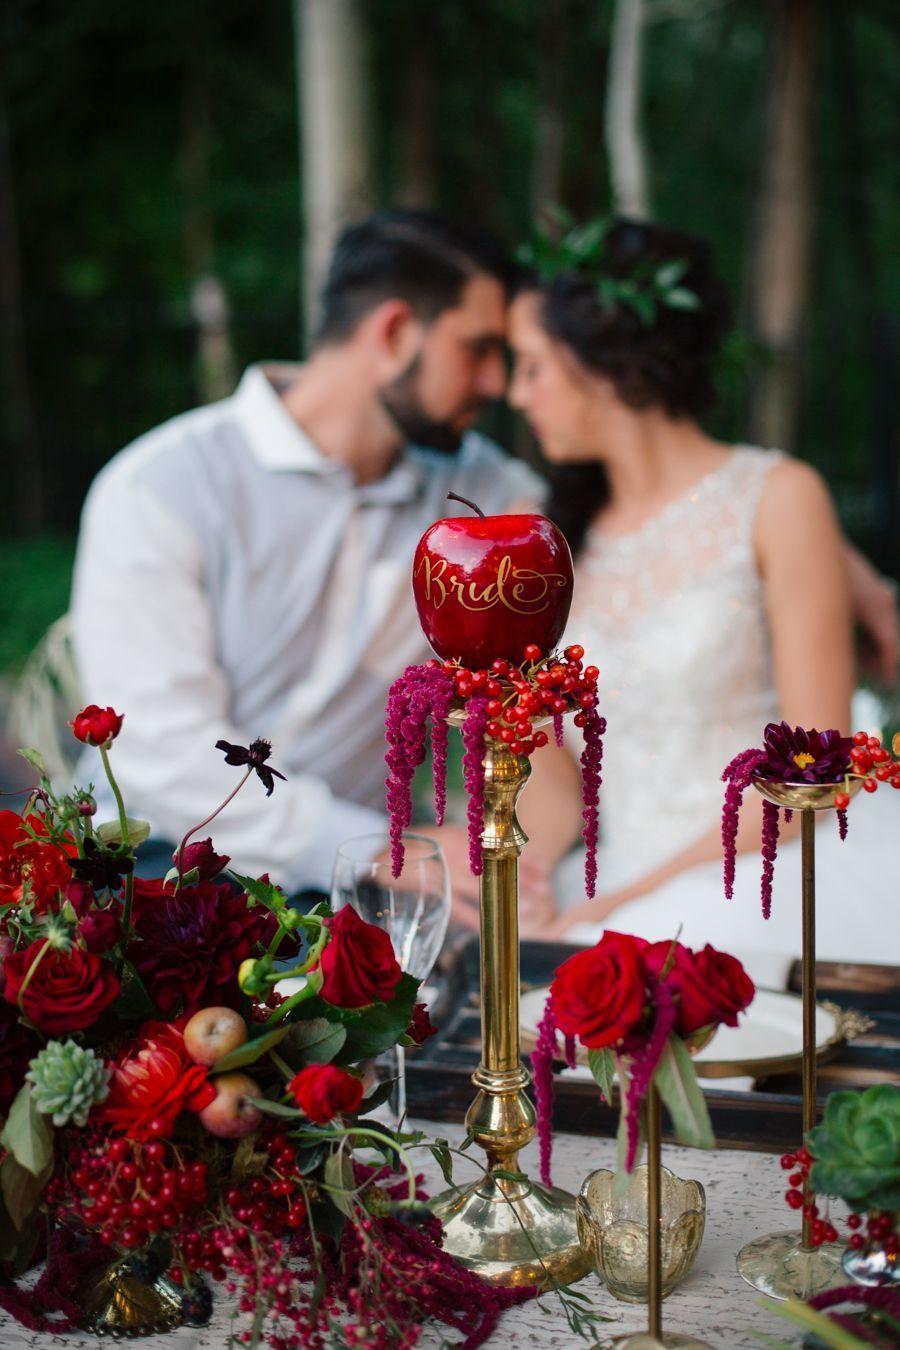 Snow White Wedding Ideas Decor Details For Weddings Events